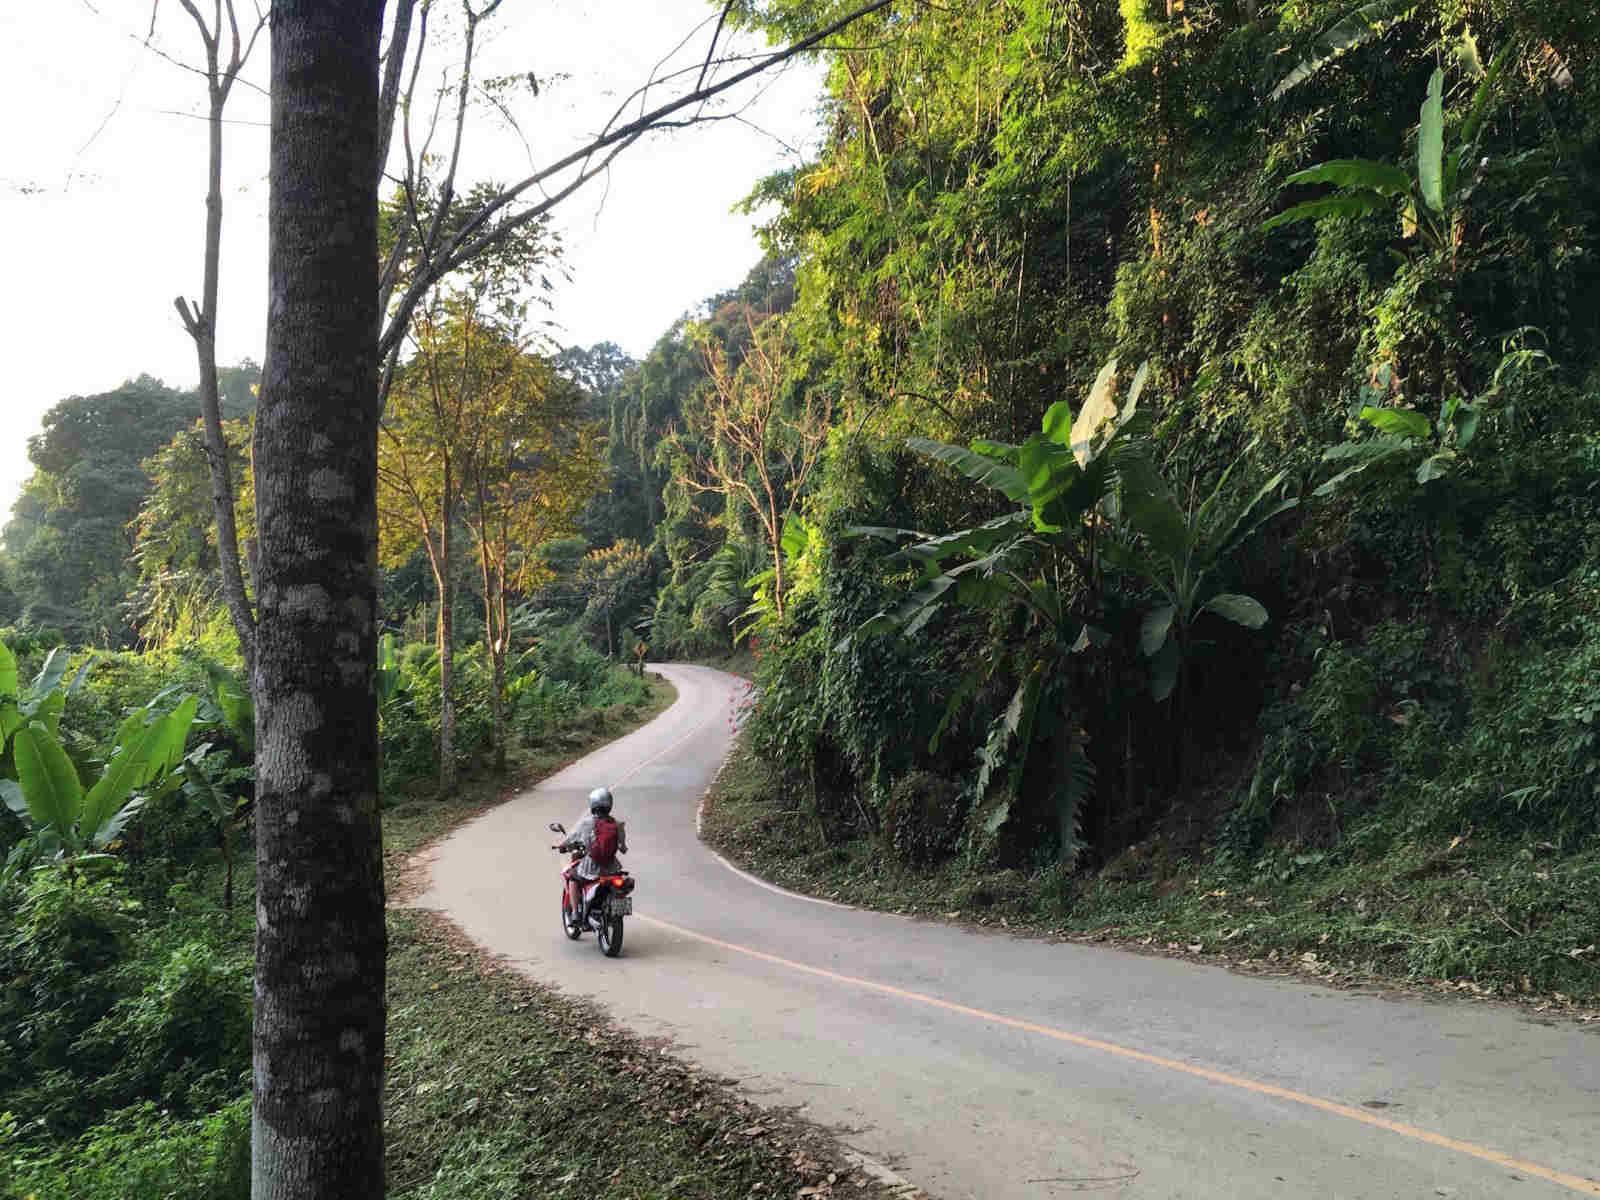 Explorations on motorbikes